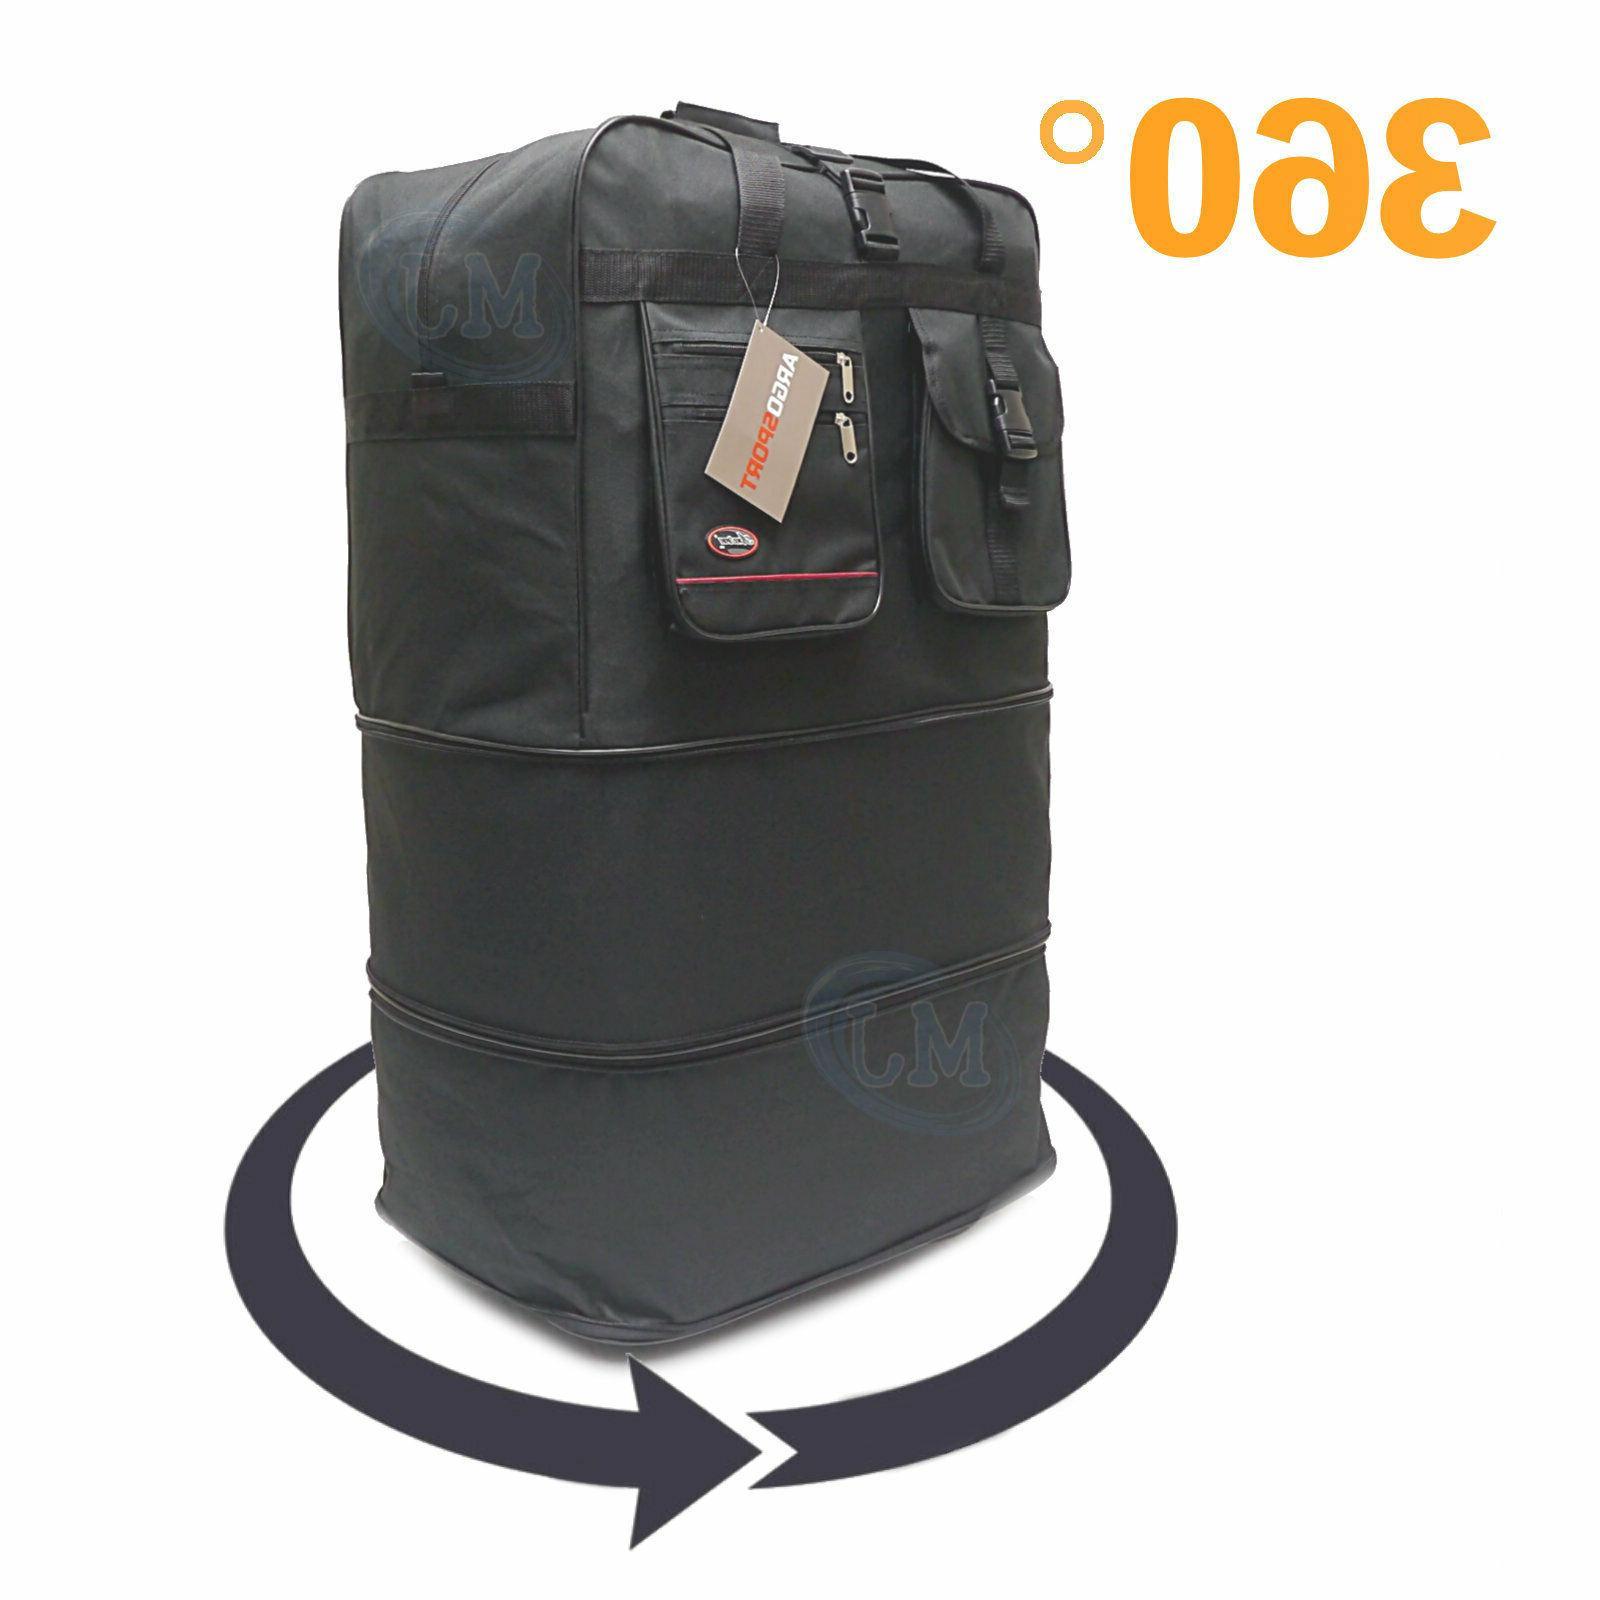 "40"" Expandable Luggage Wheeled Bag USA"